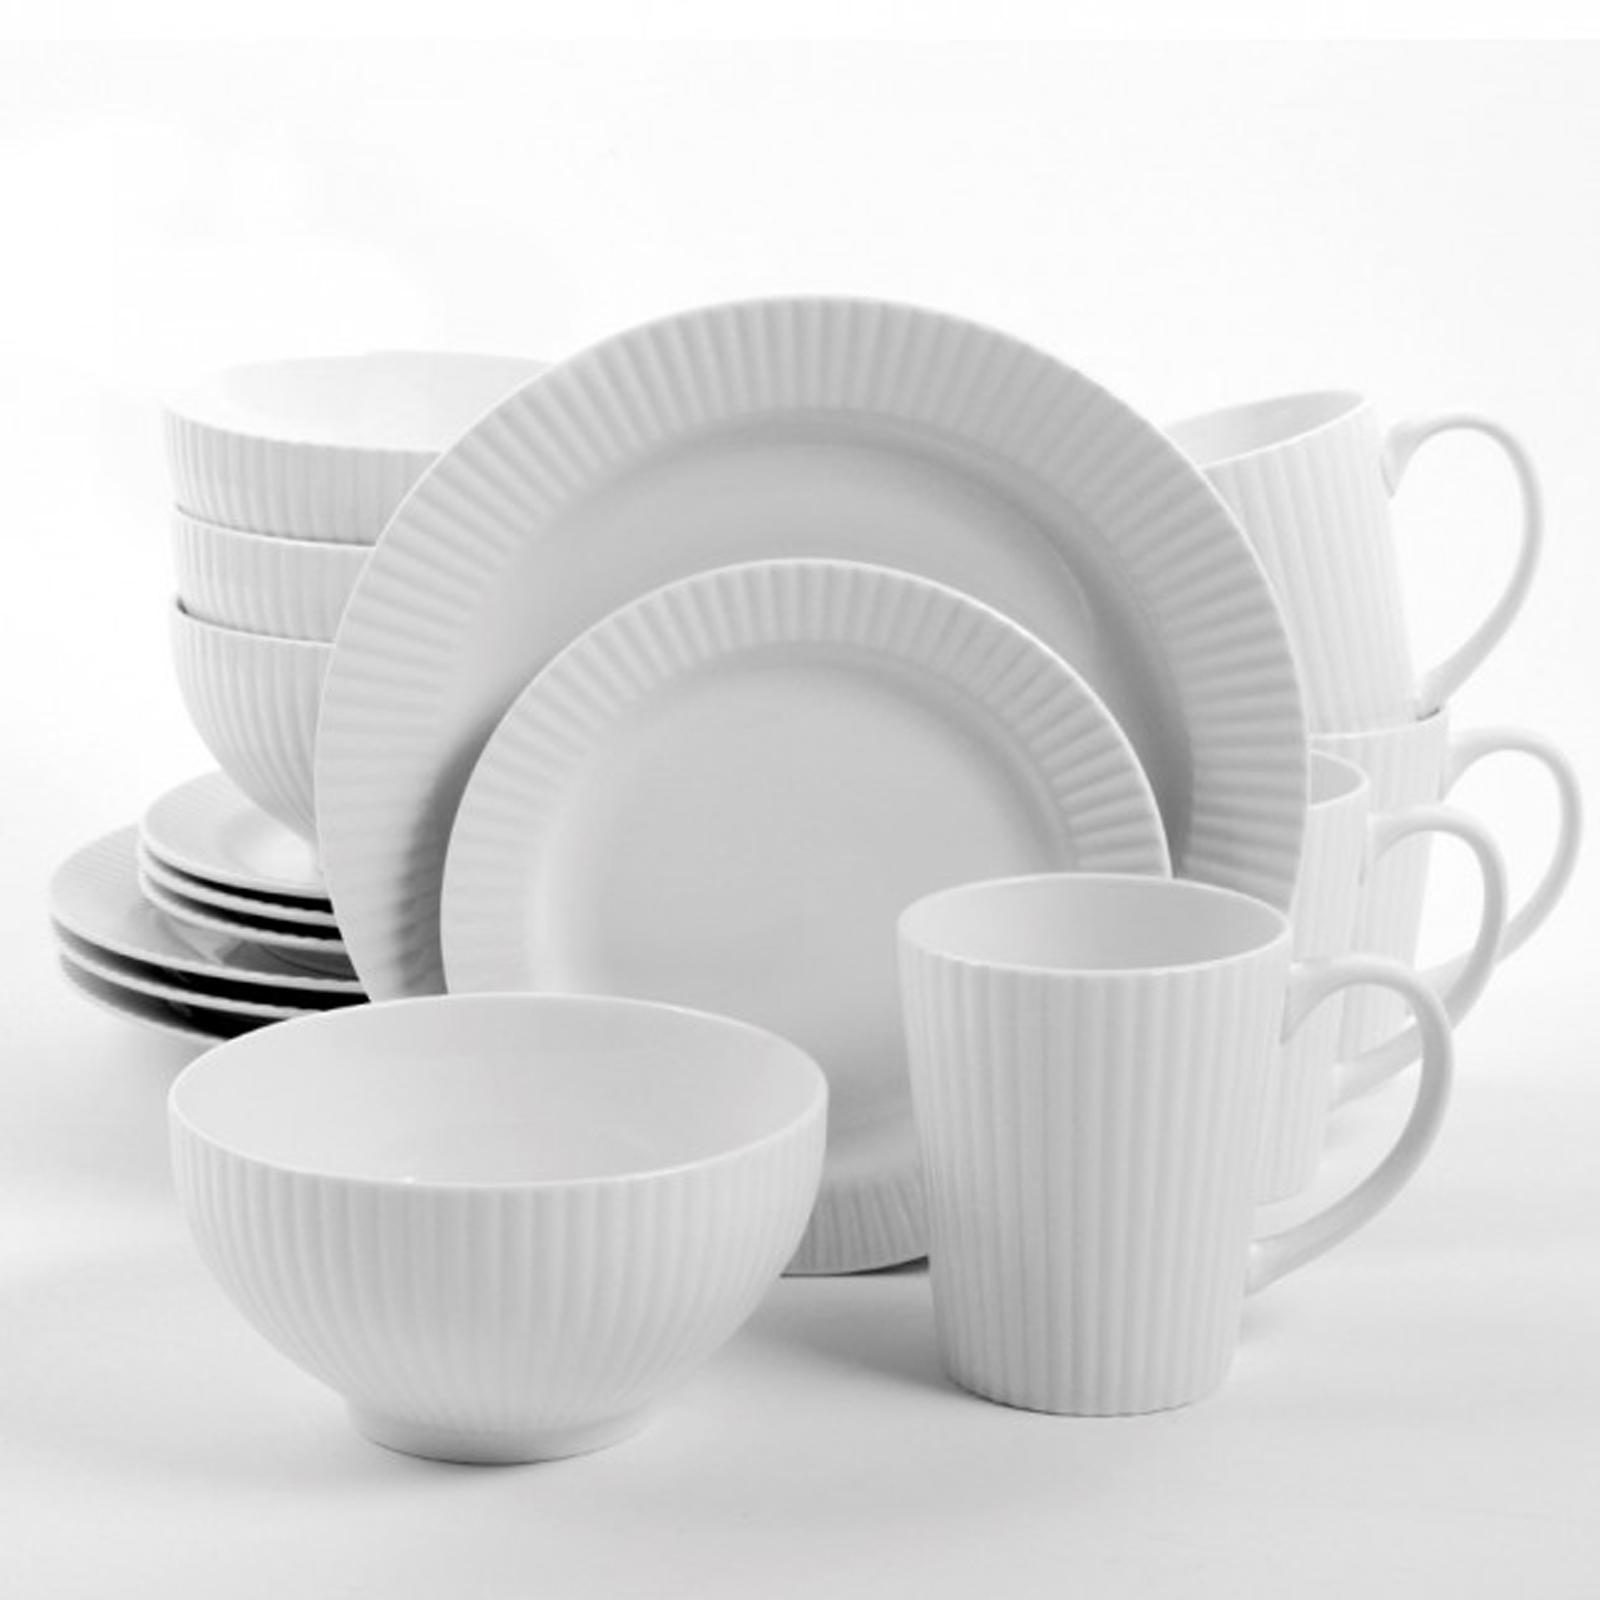 Gibson Amelia Court 16 Piece Dinnerware Set in White Embossed